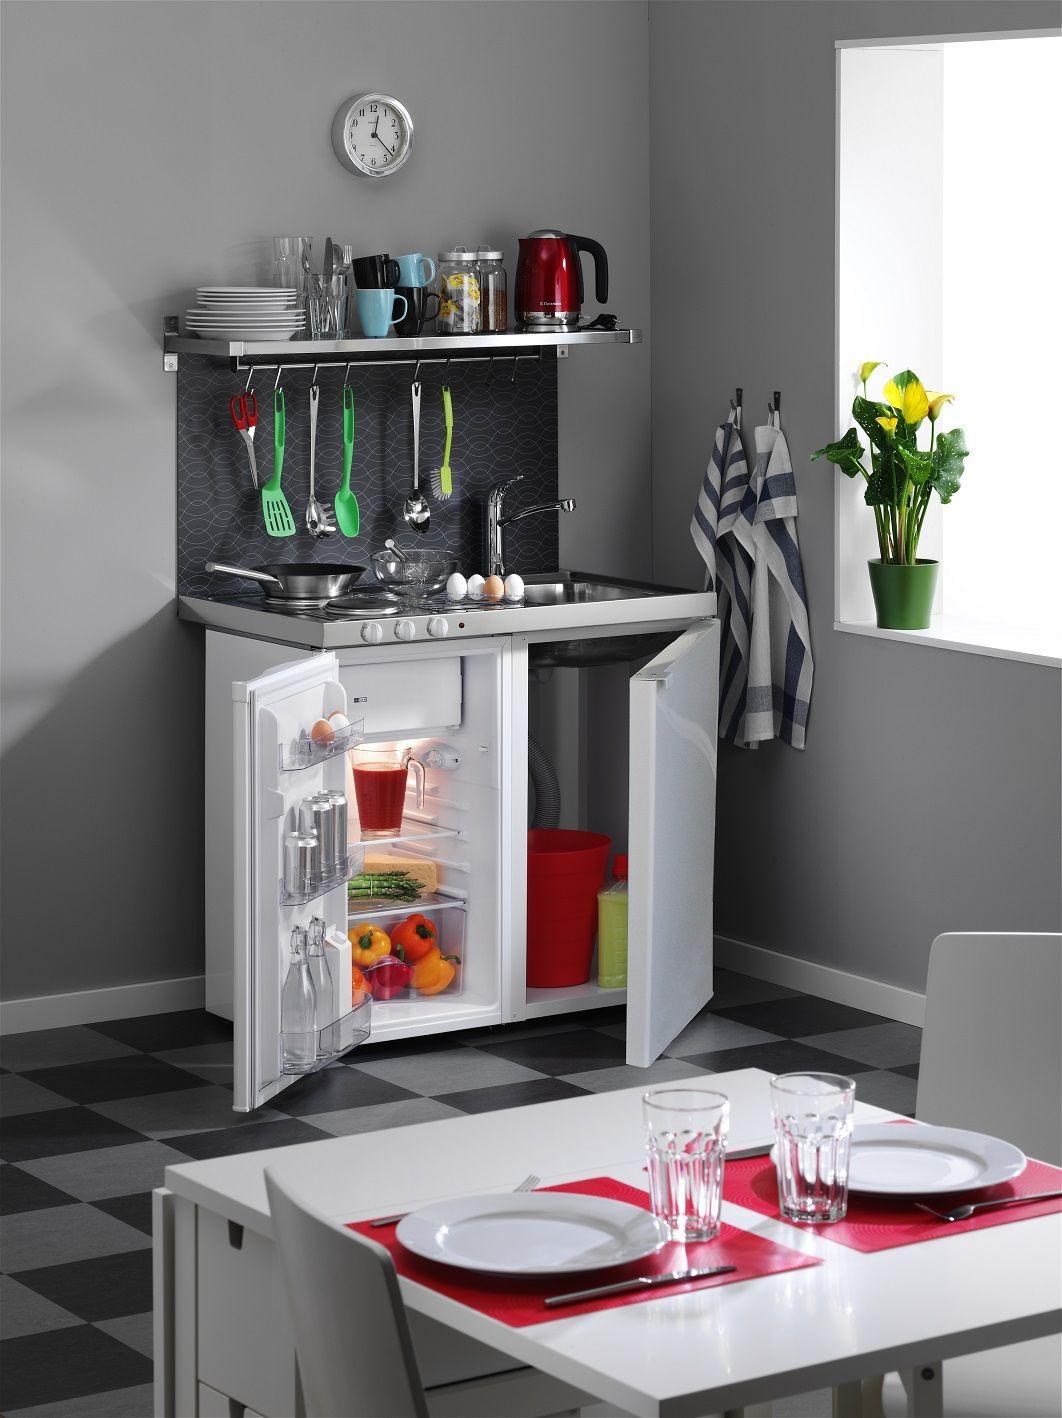 john strand mini kitchen hacks mini kitchen compact. Black Bedroom Furniture Sets. Home Design Ideas